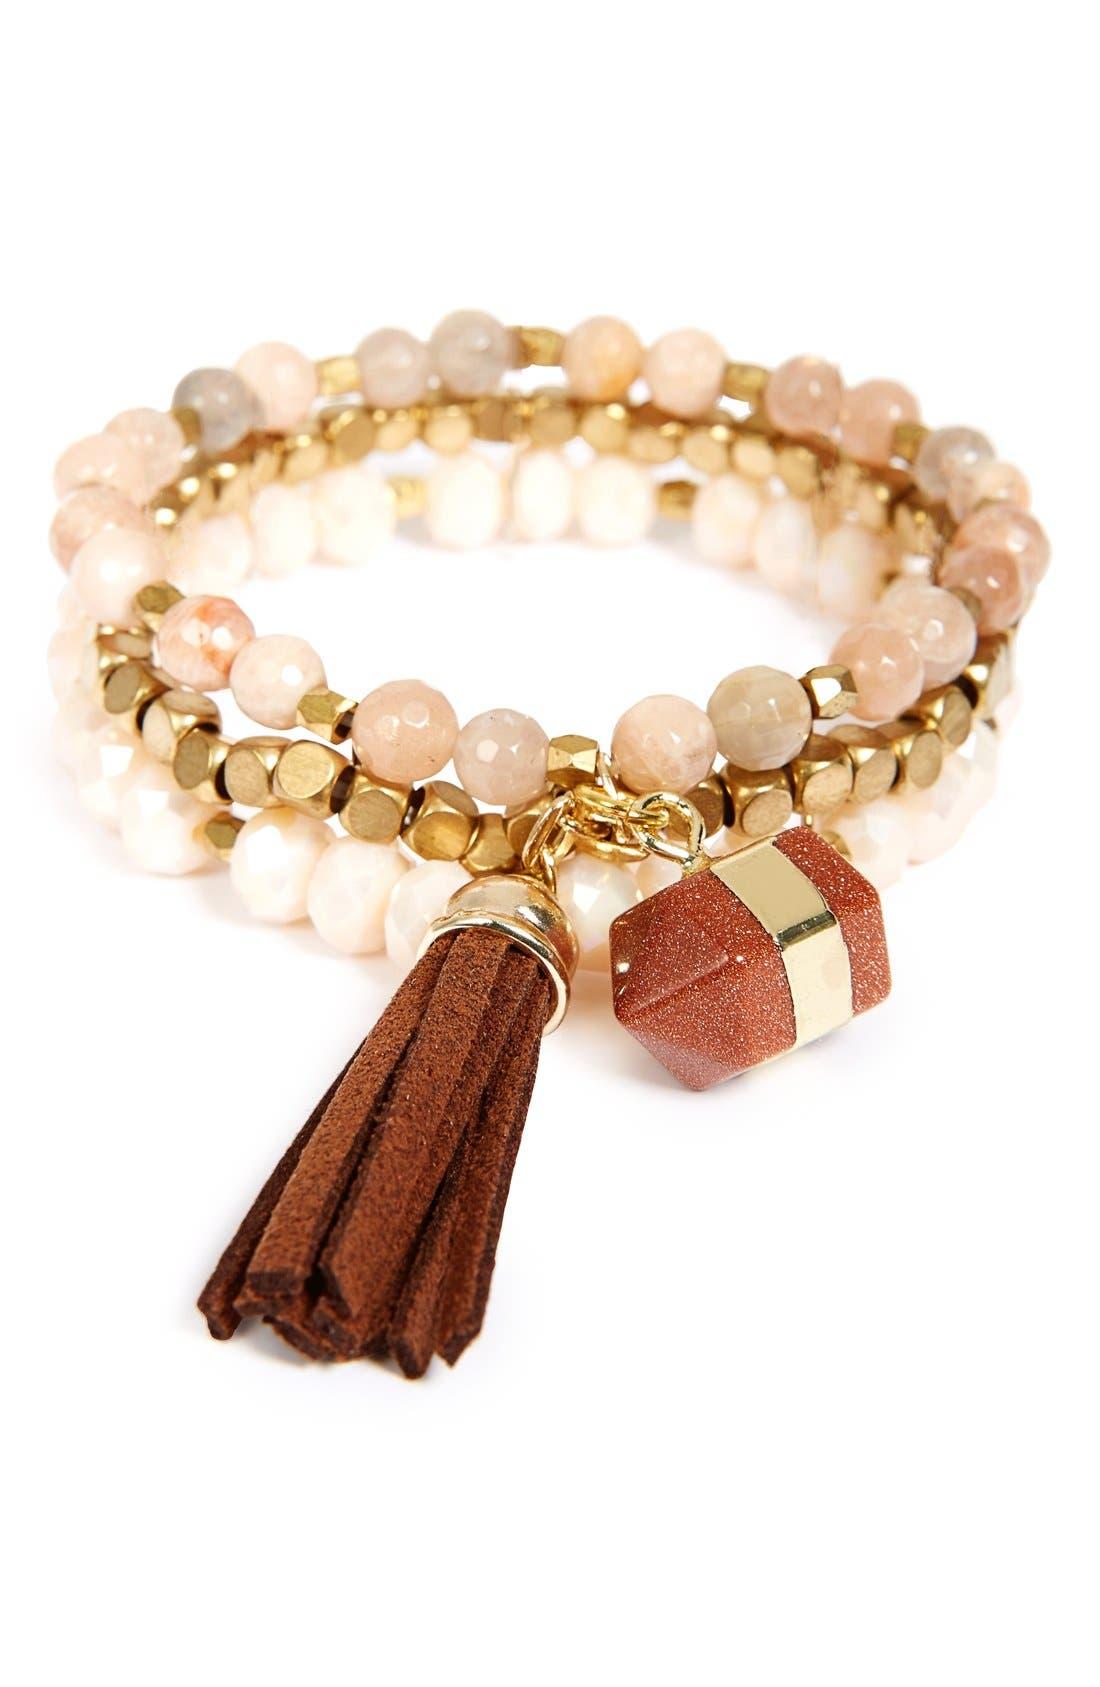 Main Image - Panacea Stone & Bead Multistrand Bracelet